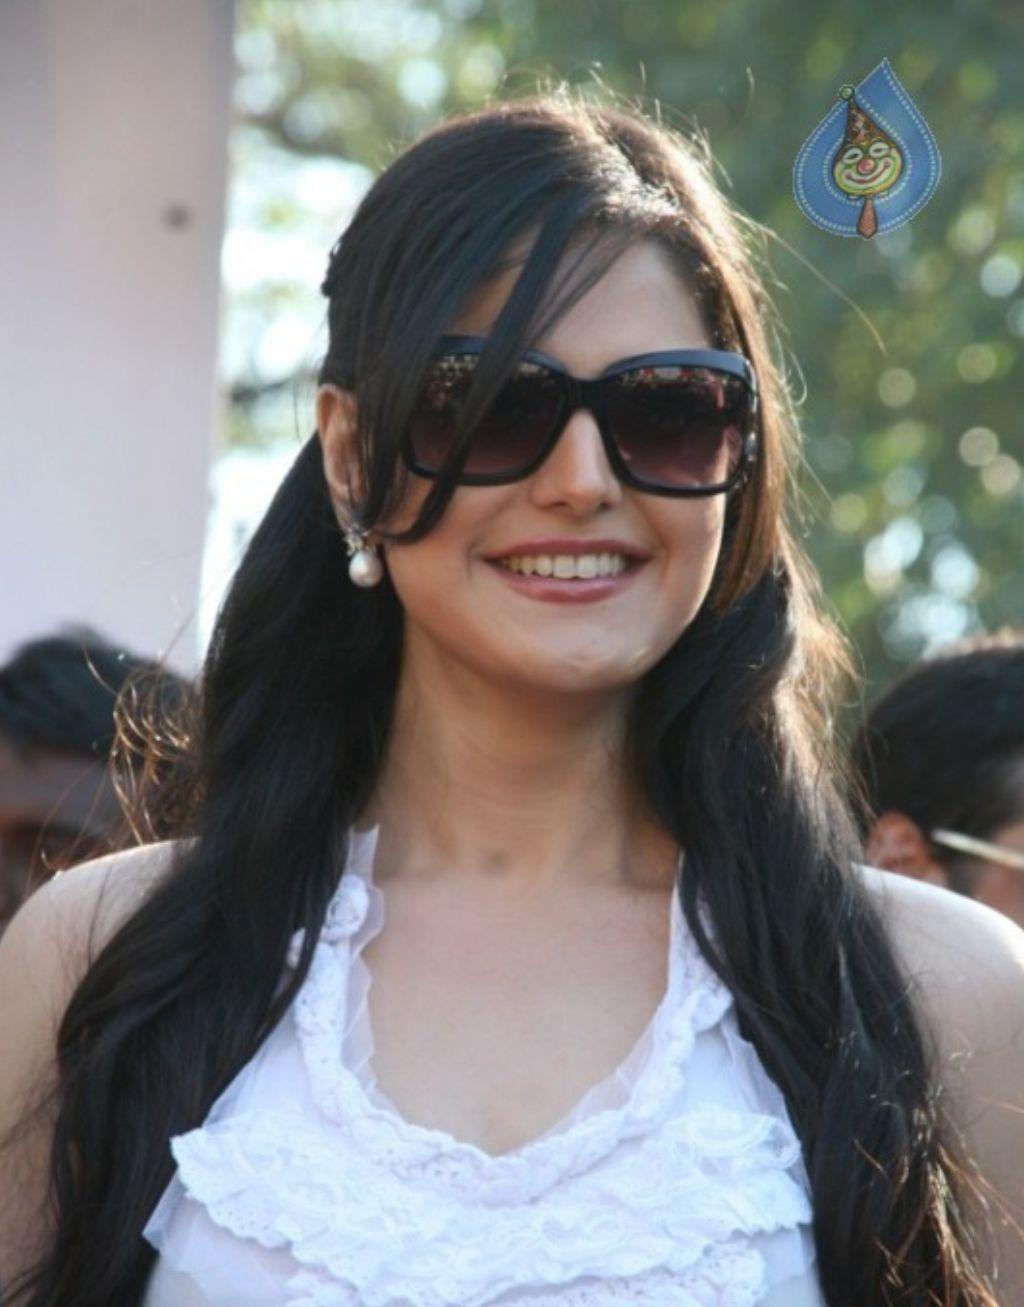 http://4.bp.blogspot.com/-CGsMVcjcWl0/Th28p_HNGtI/AAAAAAAABJg/uV61yMedDGU/s1600/Zarine-Khan-Hot-Pics.jpg